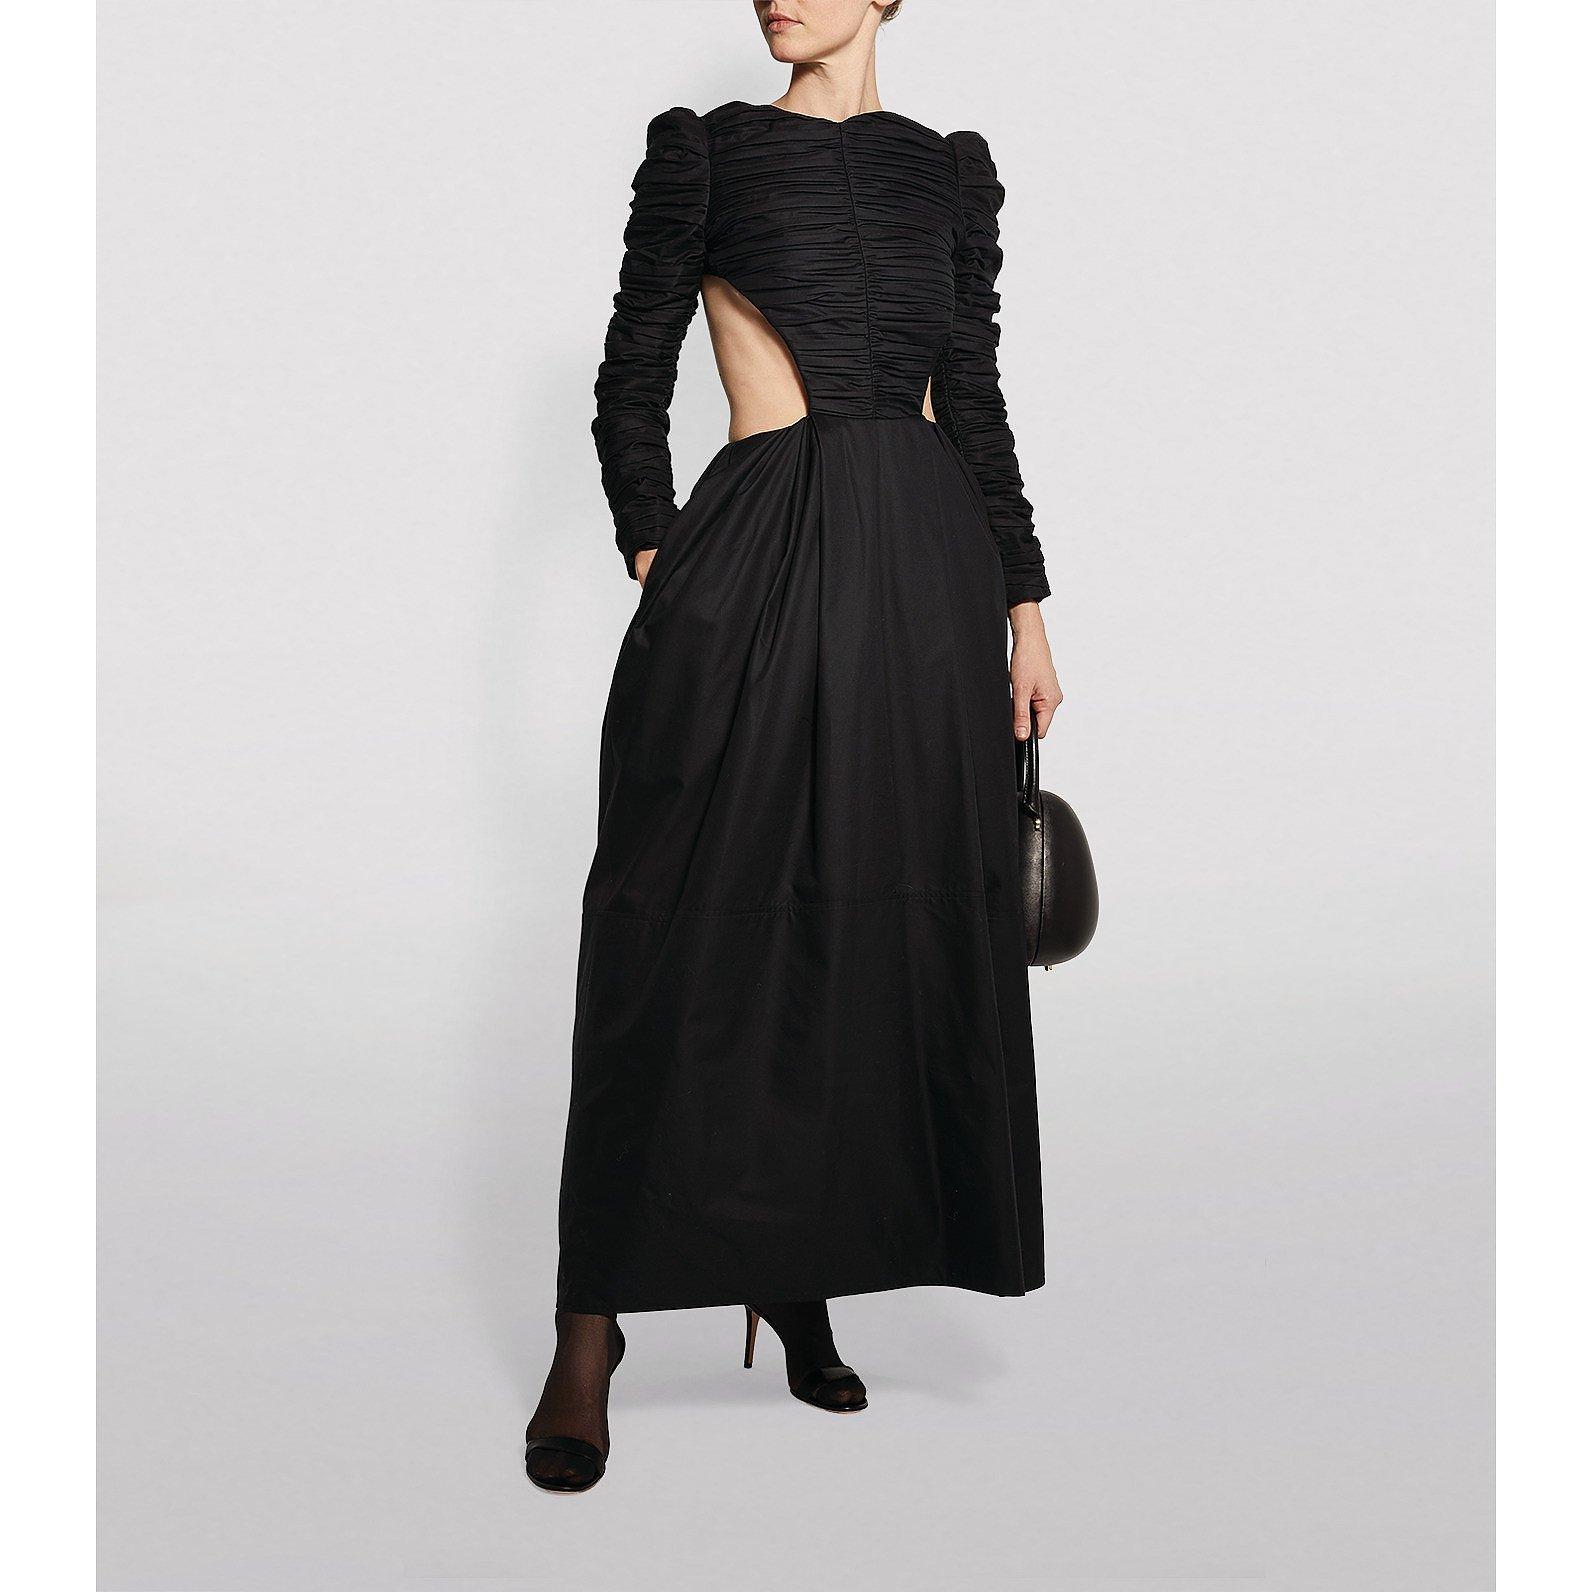 Khaite Rosaline Petticoat Dress